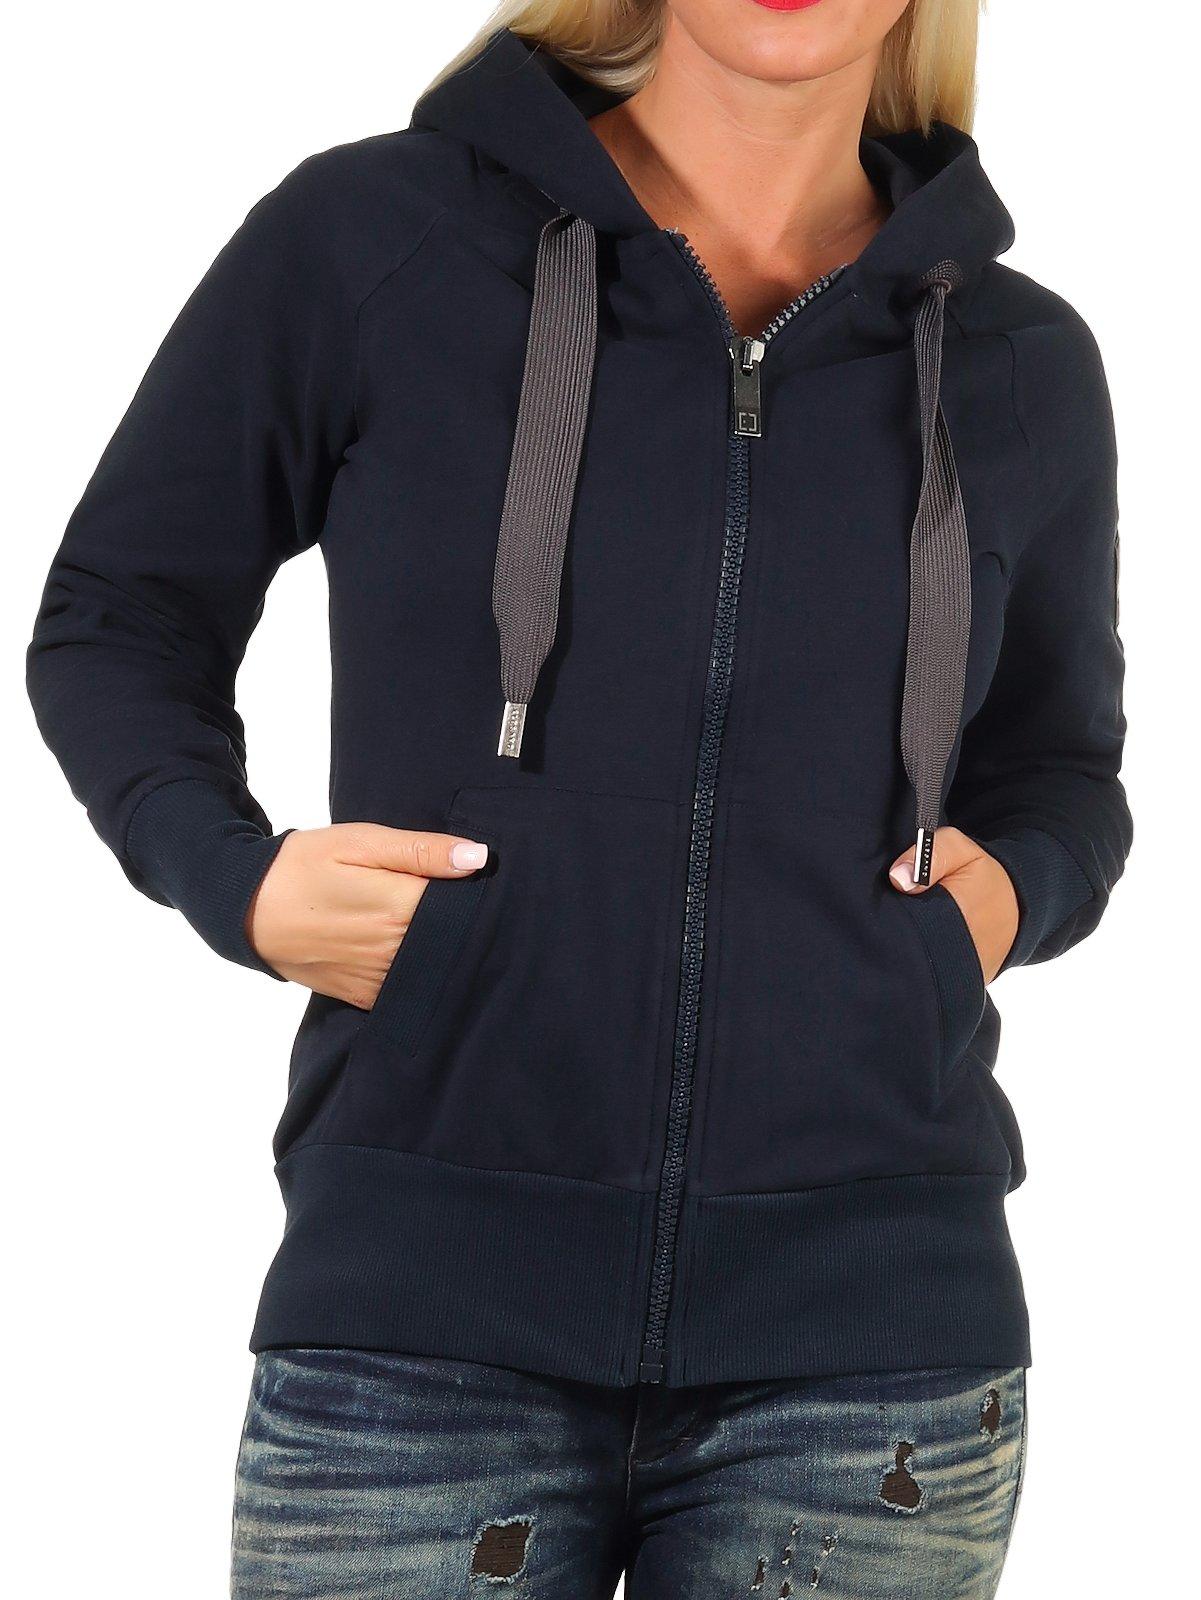 Damen Sweatjacke Jacke Damenjacke Zip Hoodie Sweatshirt Elbsand Keki